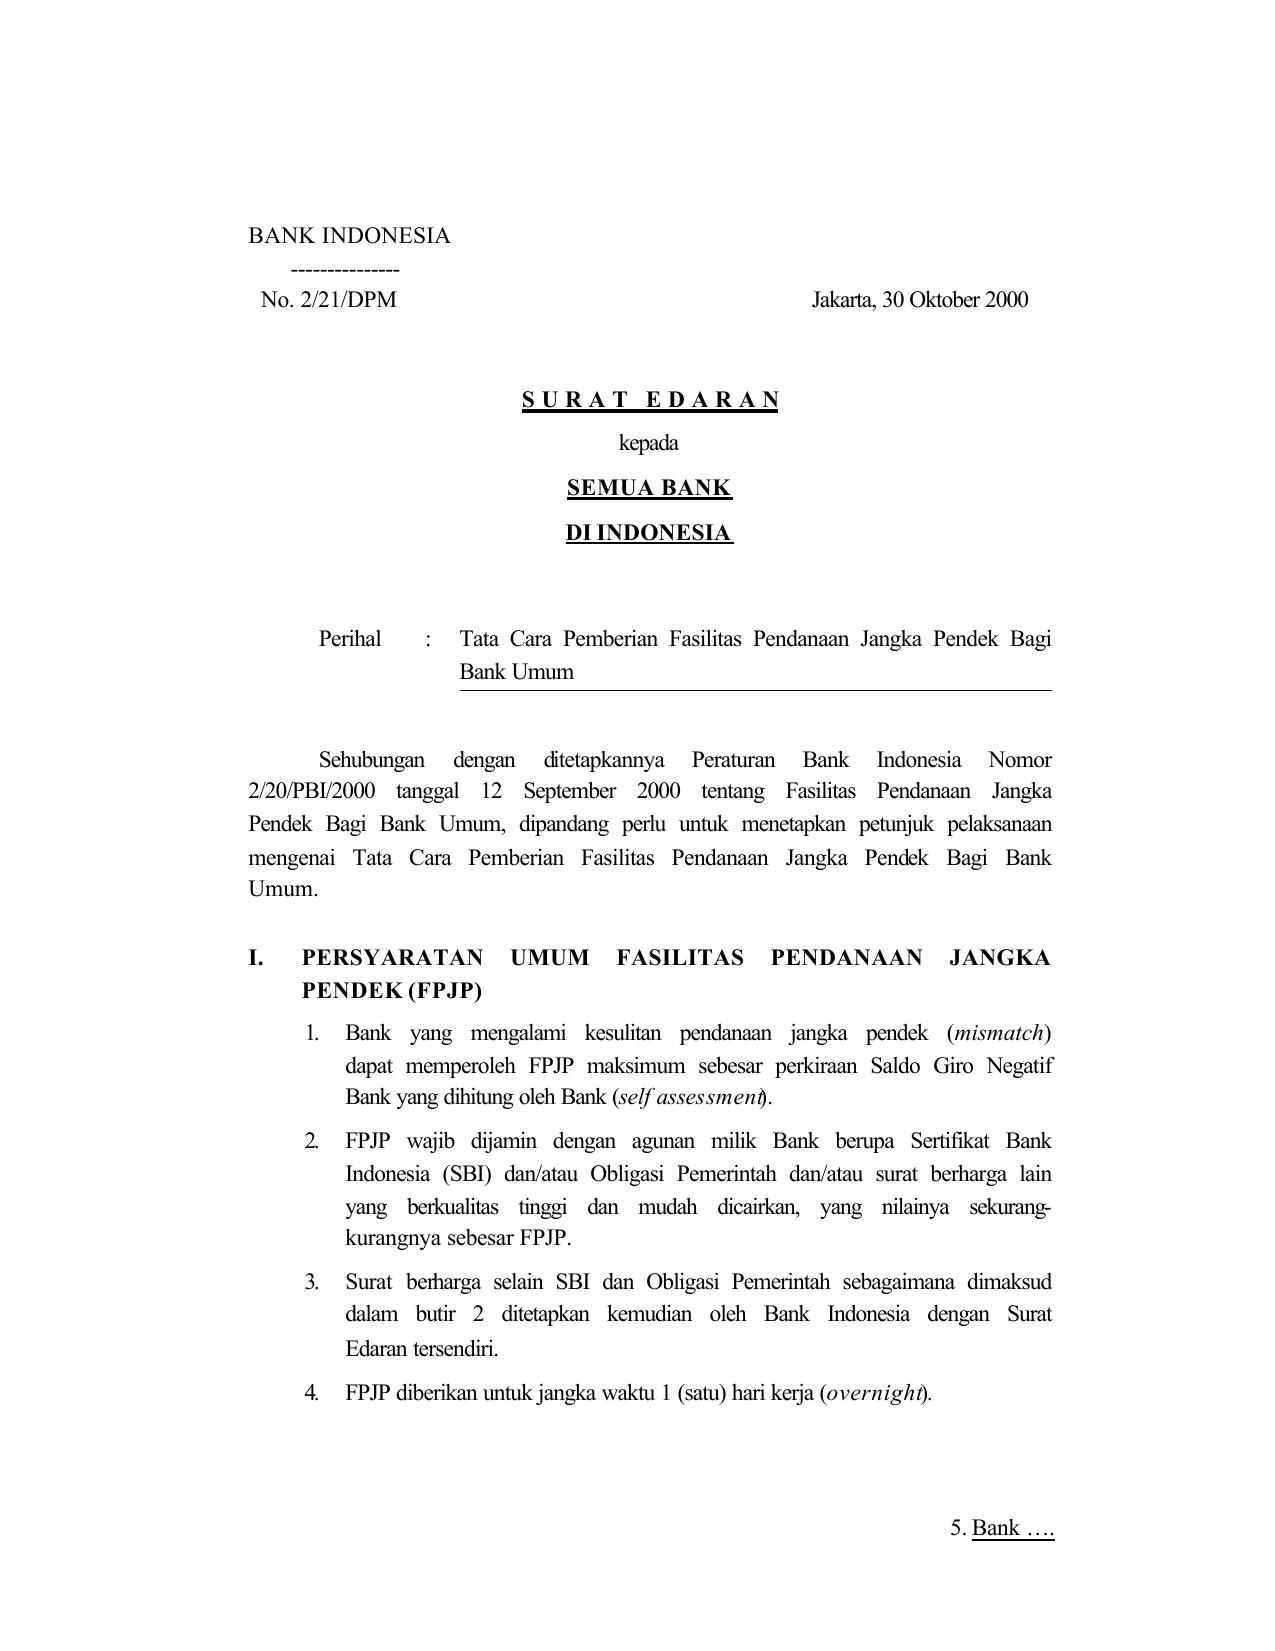 No 221dpm Jakarta 30 Oktober 2000